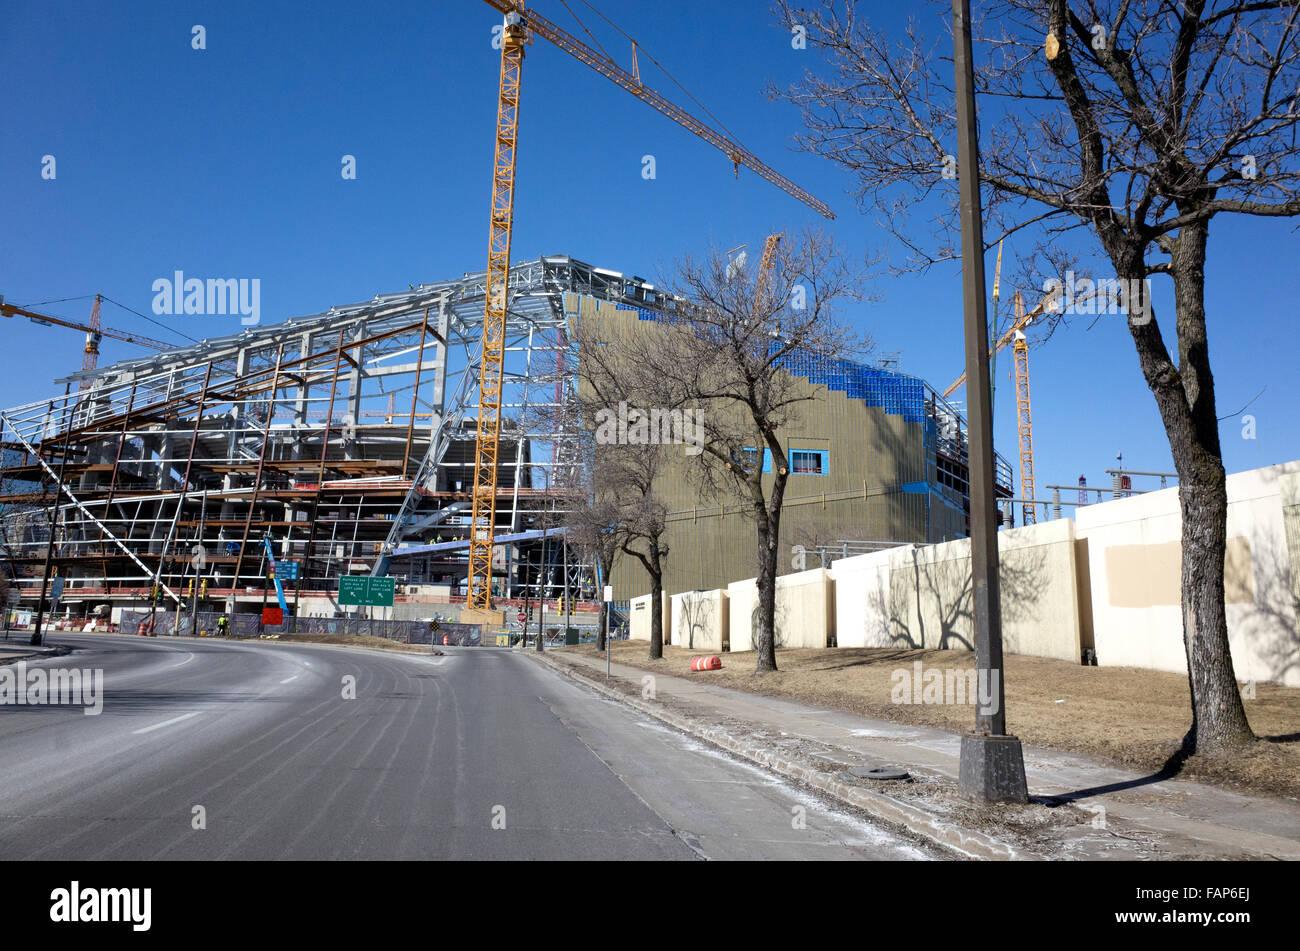 Construction of The NFL Minnesota Viking U.S. Bank Stadium March 2nd 2015. Minneapolis Minnesota MN USA - Stock Image